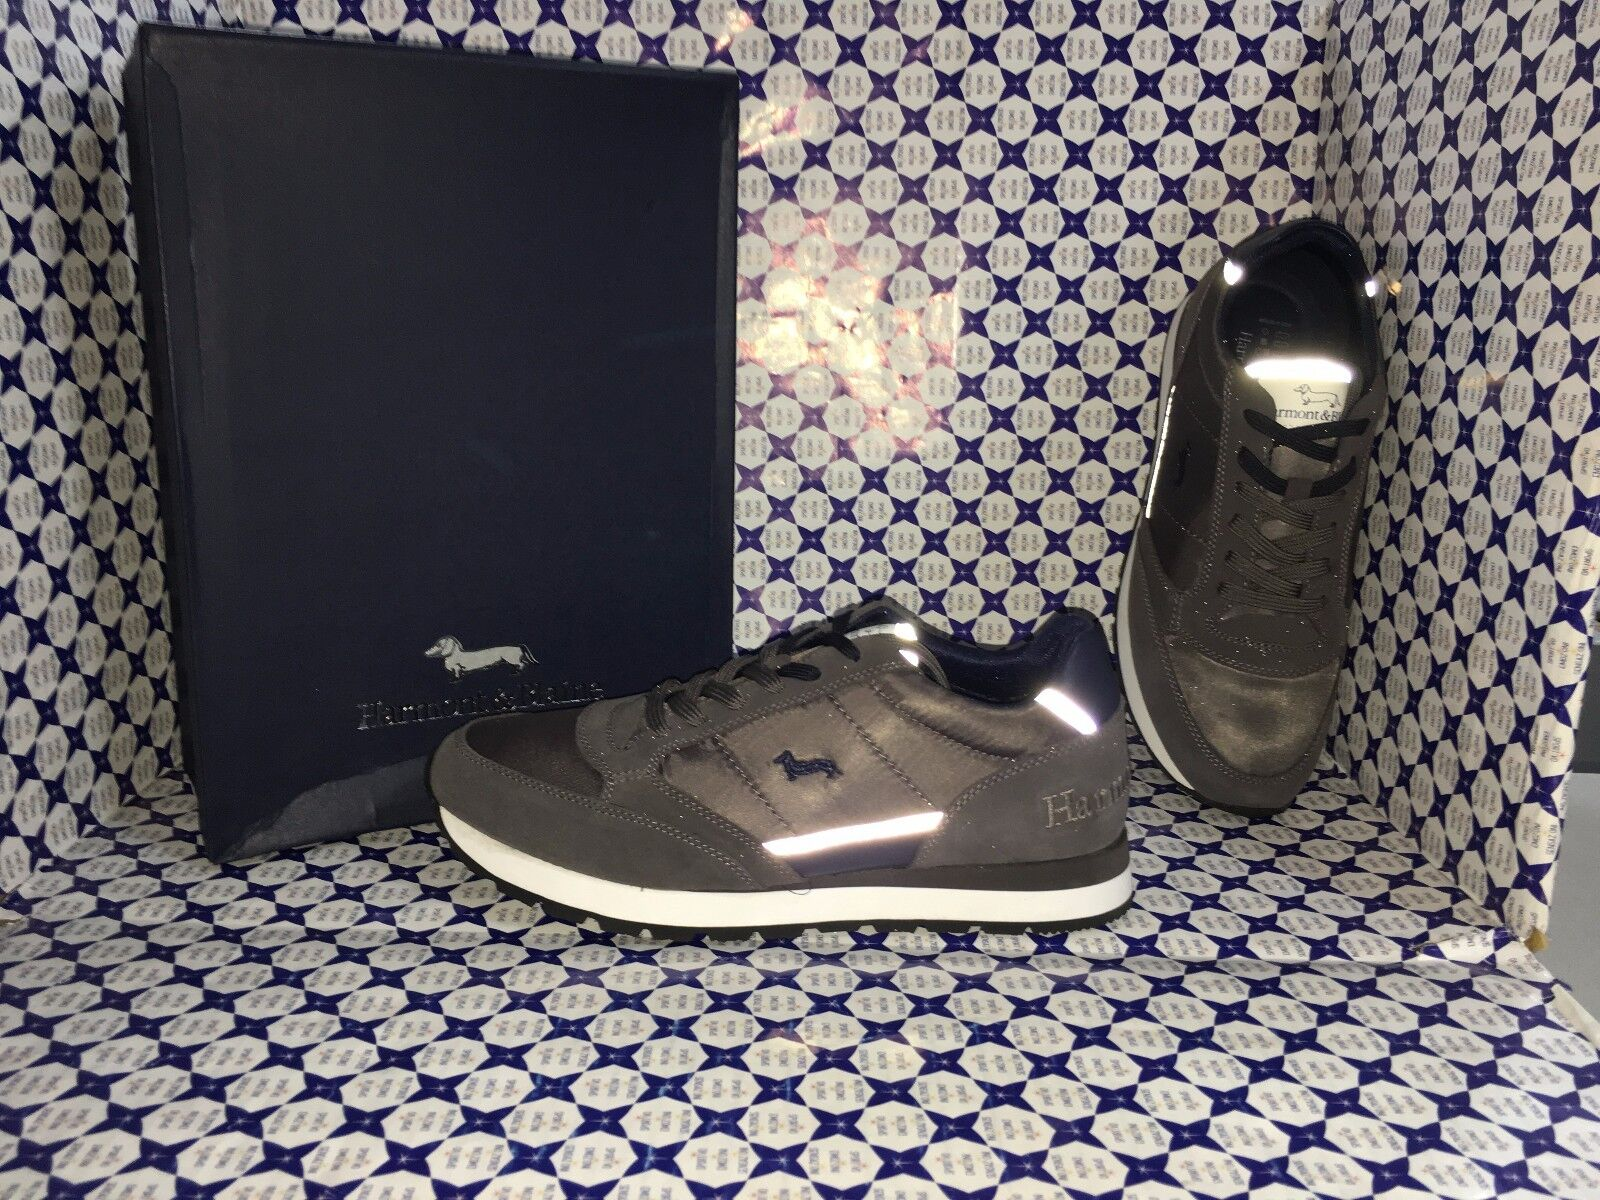 shoes HARMONT & BLAINE men - Training Camoscio NYL - Piombo - E900060